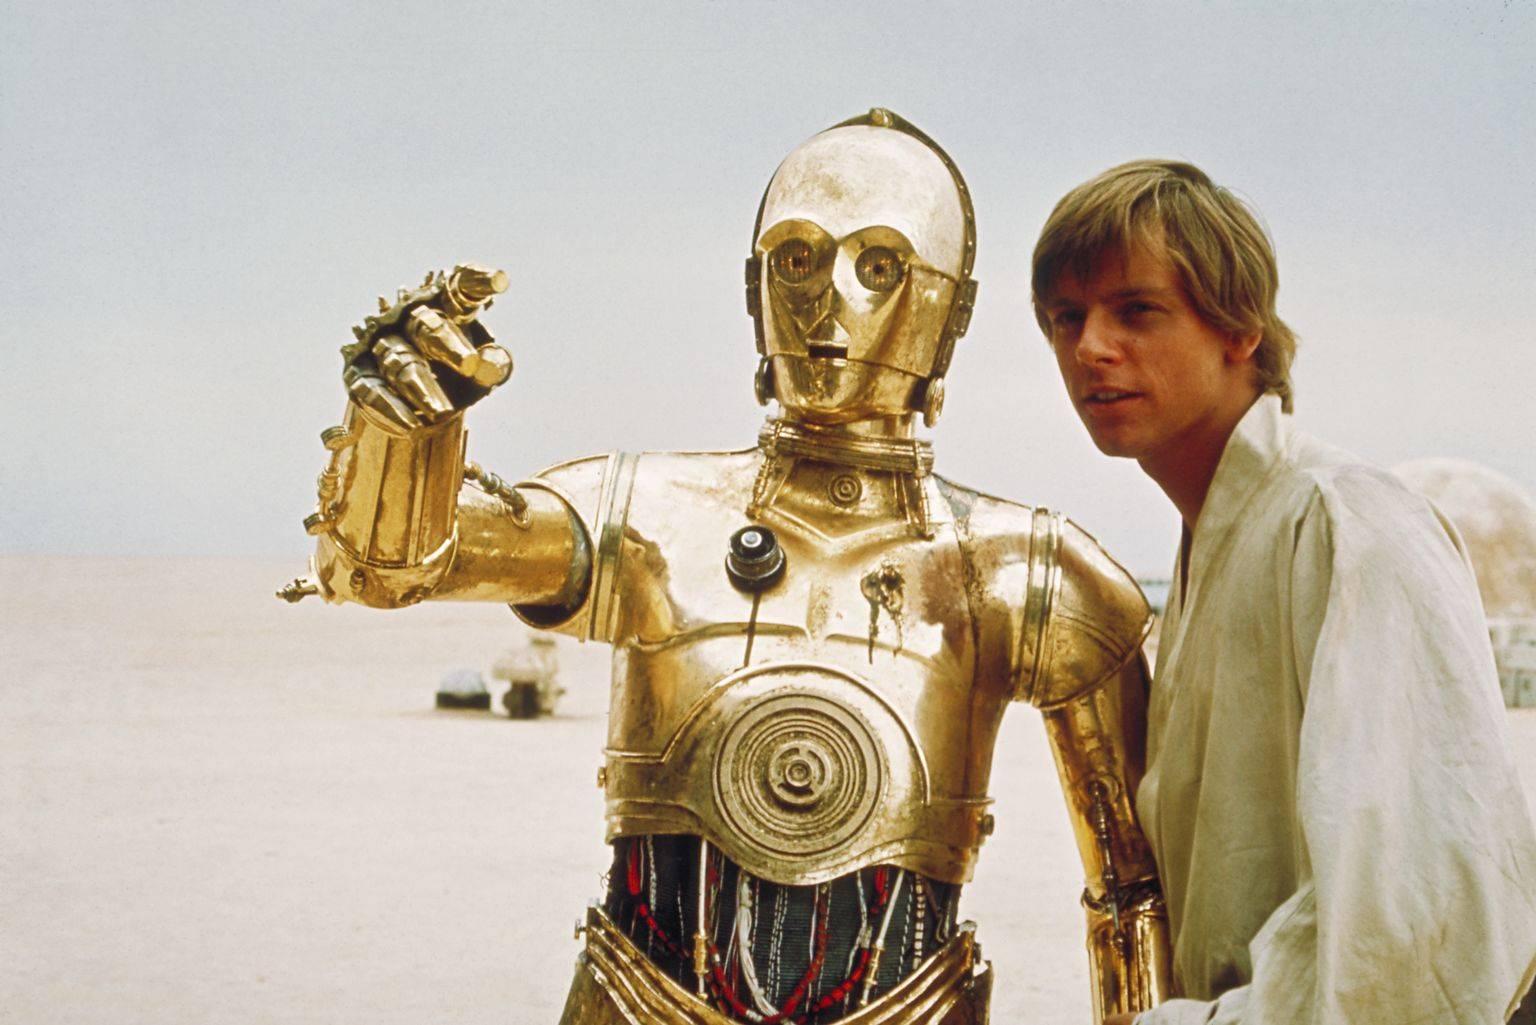 [Sideshow] Star Wars: C-3PO Sixth Scale Figure - Página 2 C3po